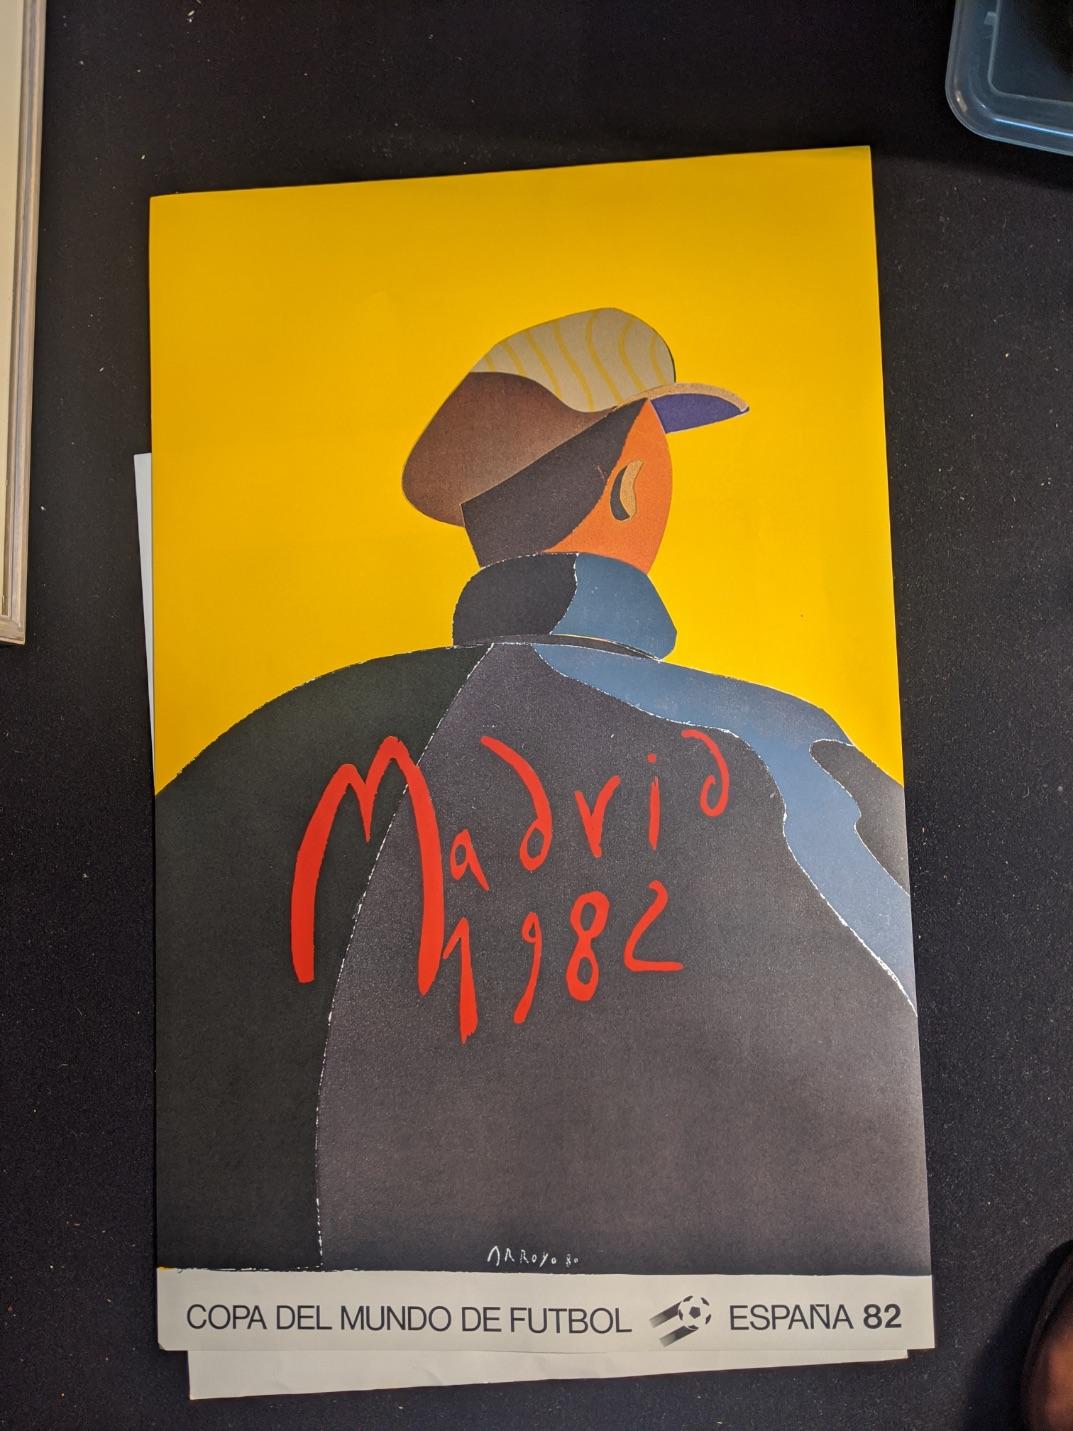 After Arroyo, Madrid 1982 Cope Del Mundo Espana 82 poster, H.94cm W.60cm - Image 2 of 2